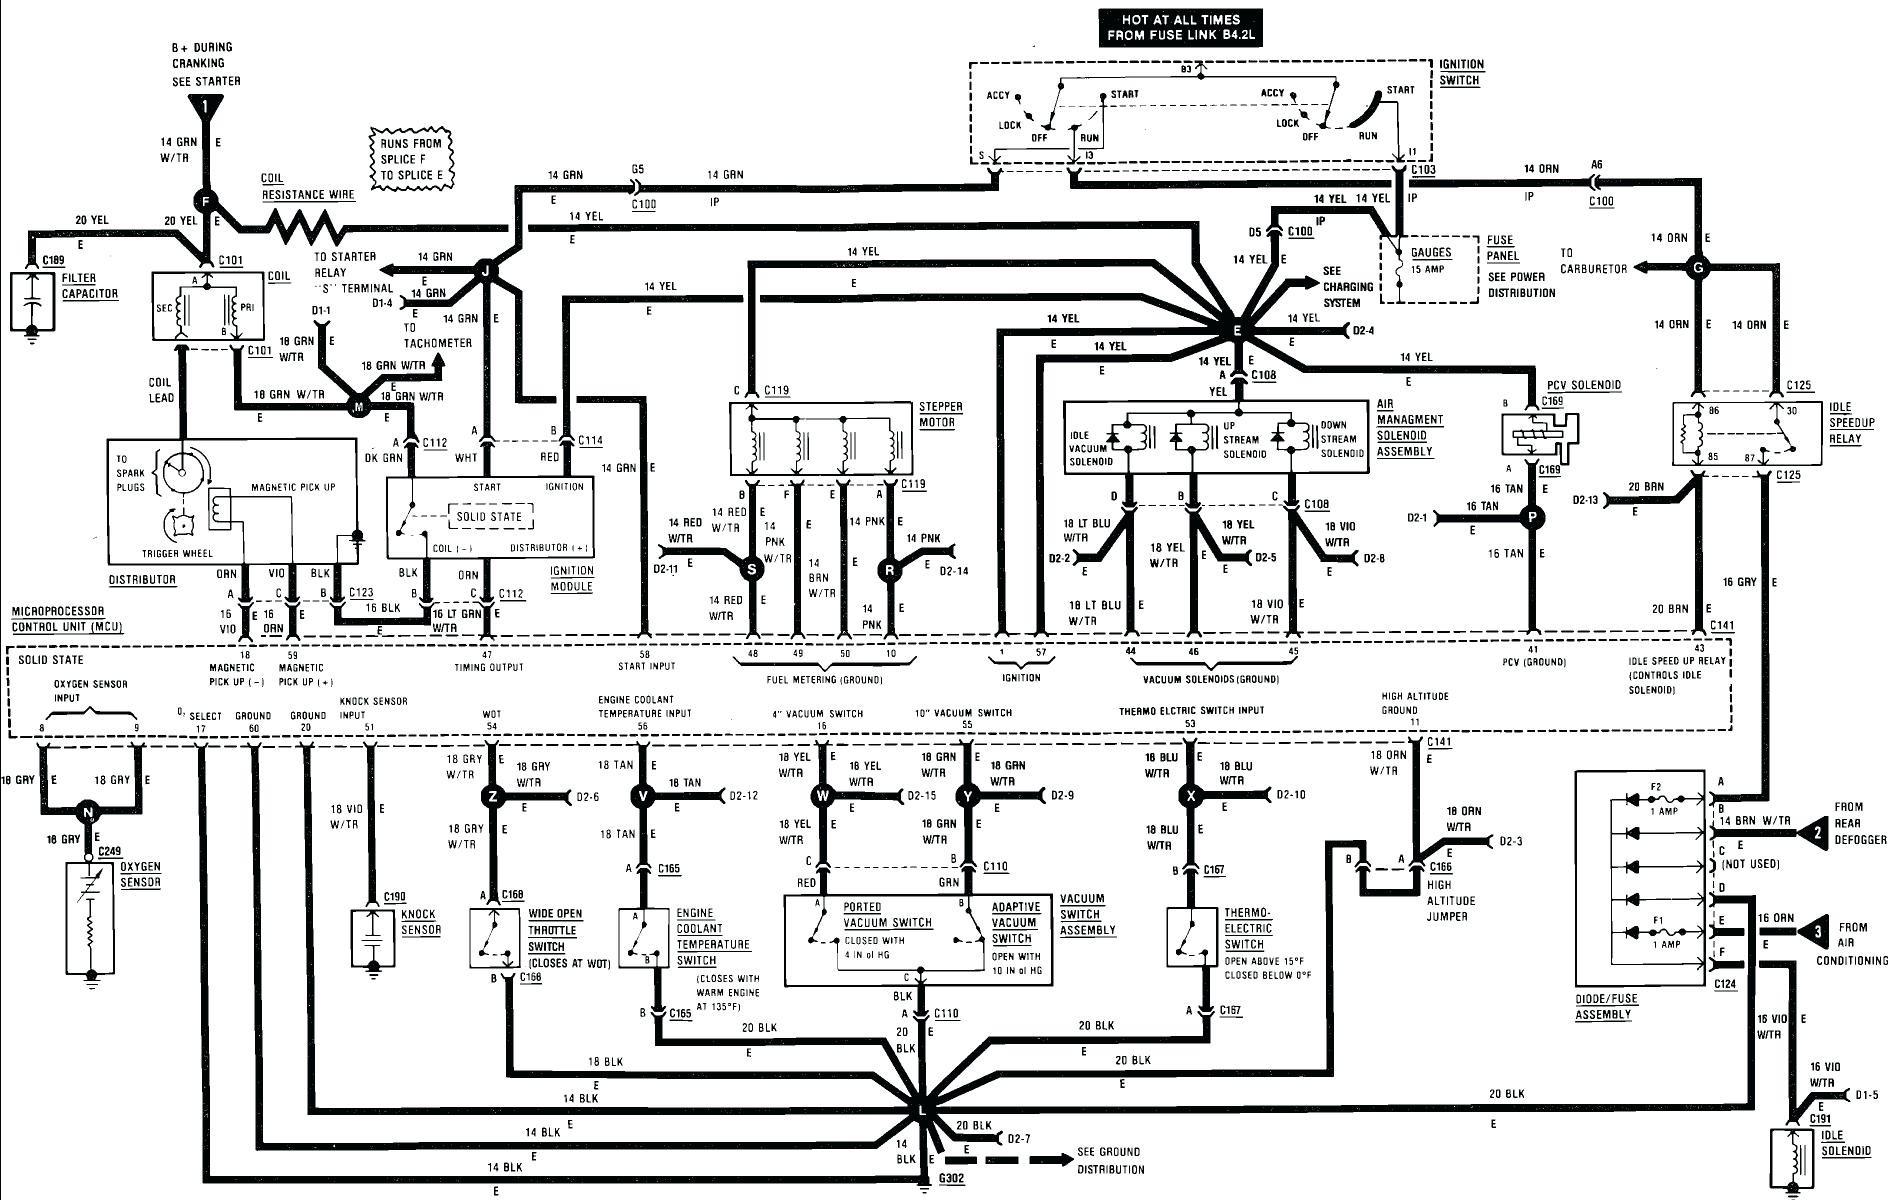 2000 Mazda Millenia Fuse Box Cover Wiring Diagram Libraries Auto Electrical Diagram2000